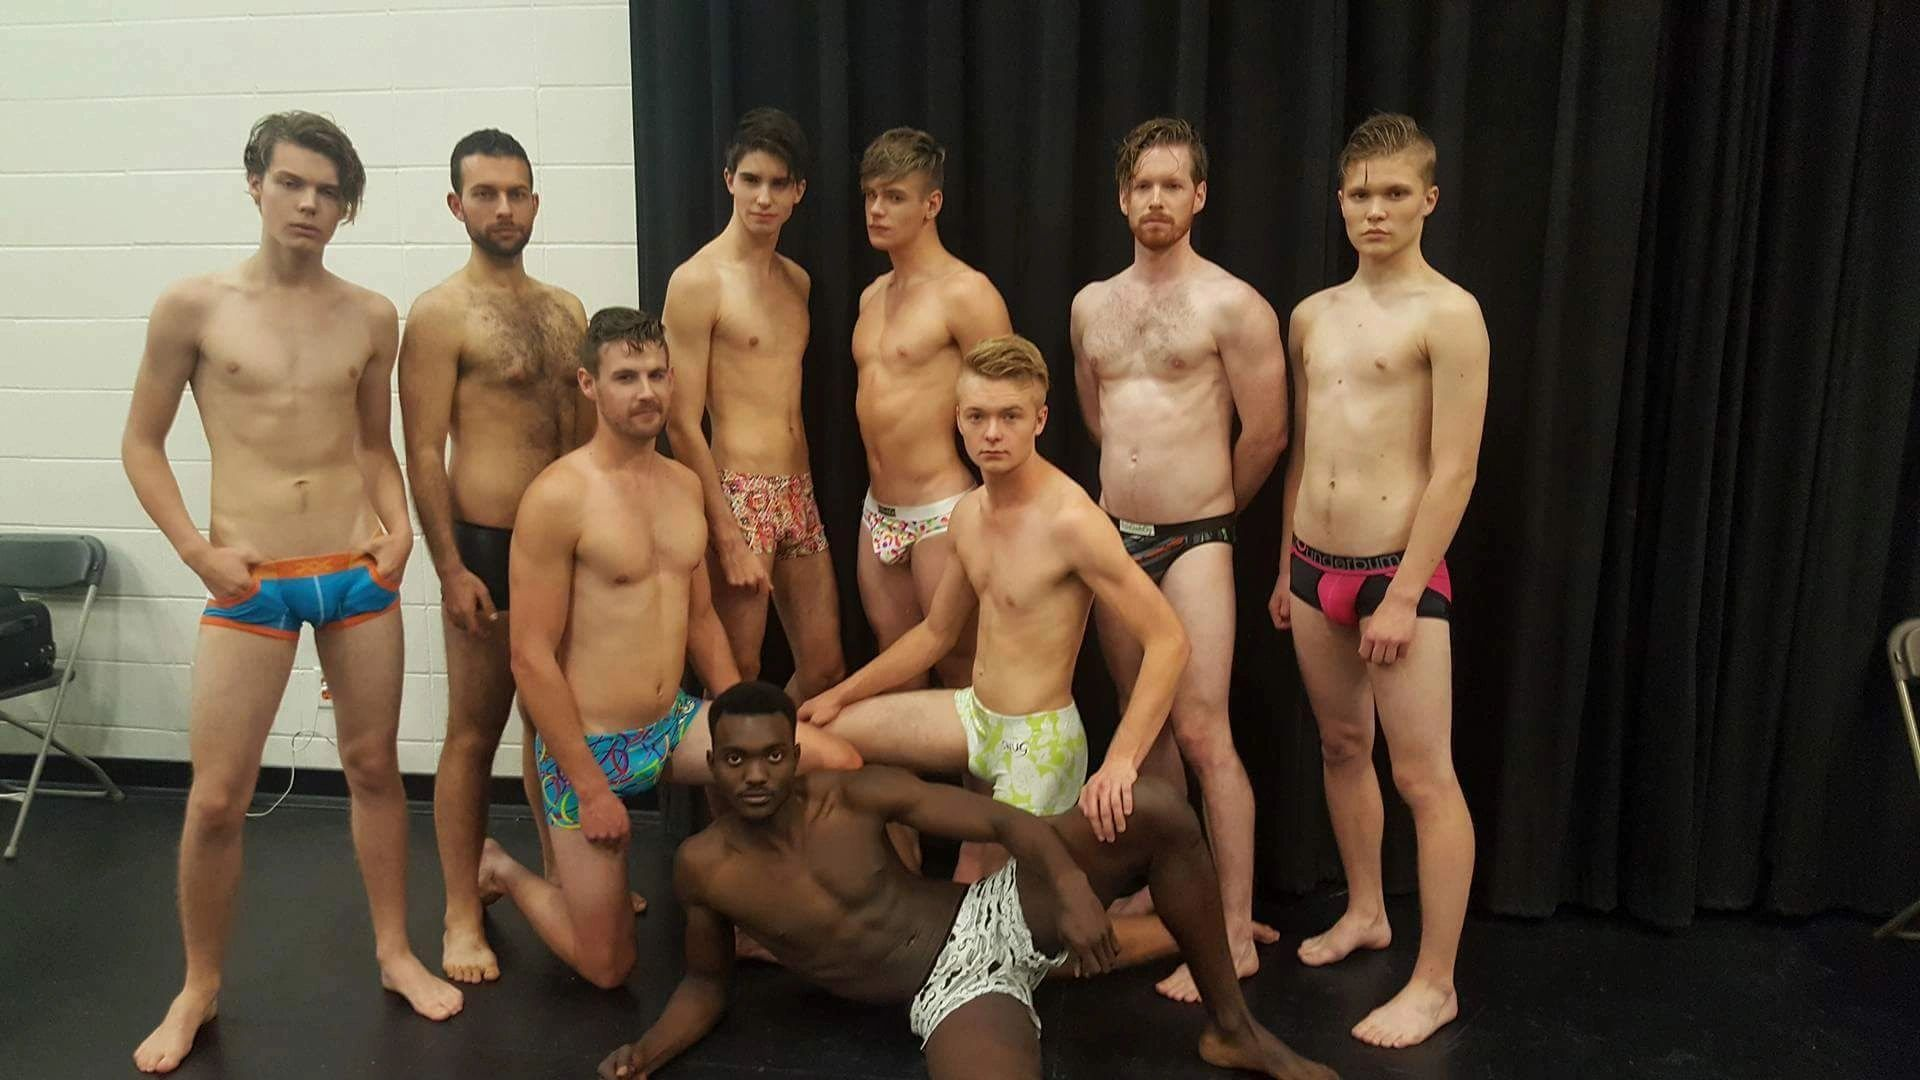 Gay photos hot male underwear photo